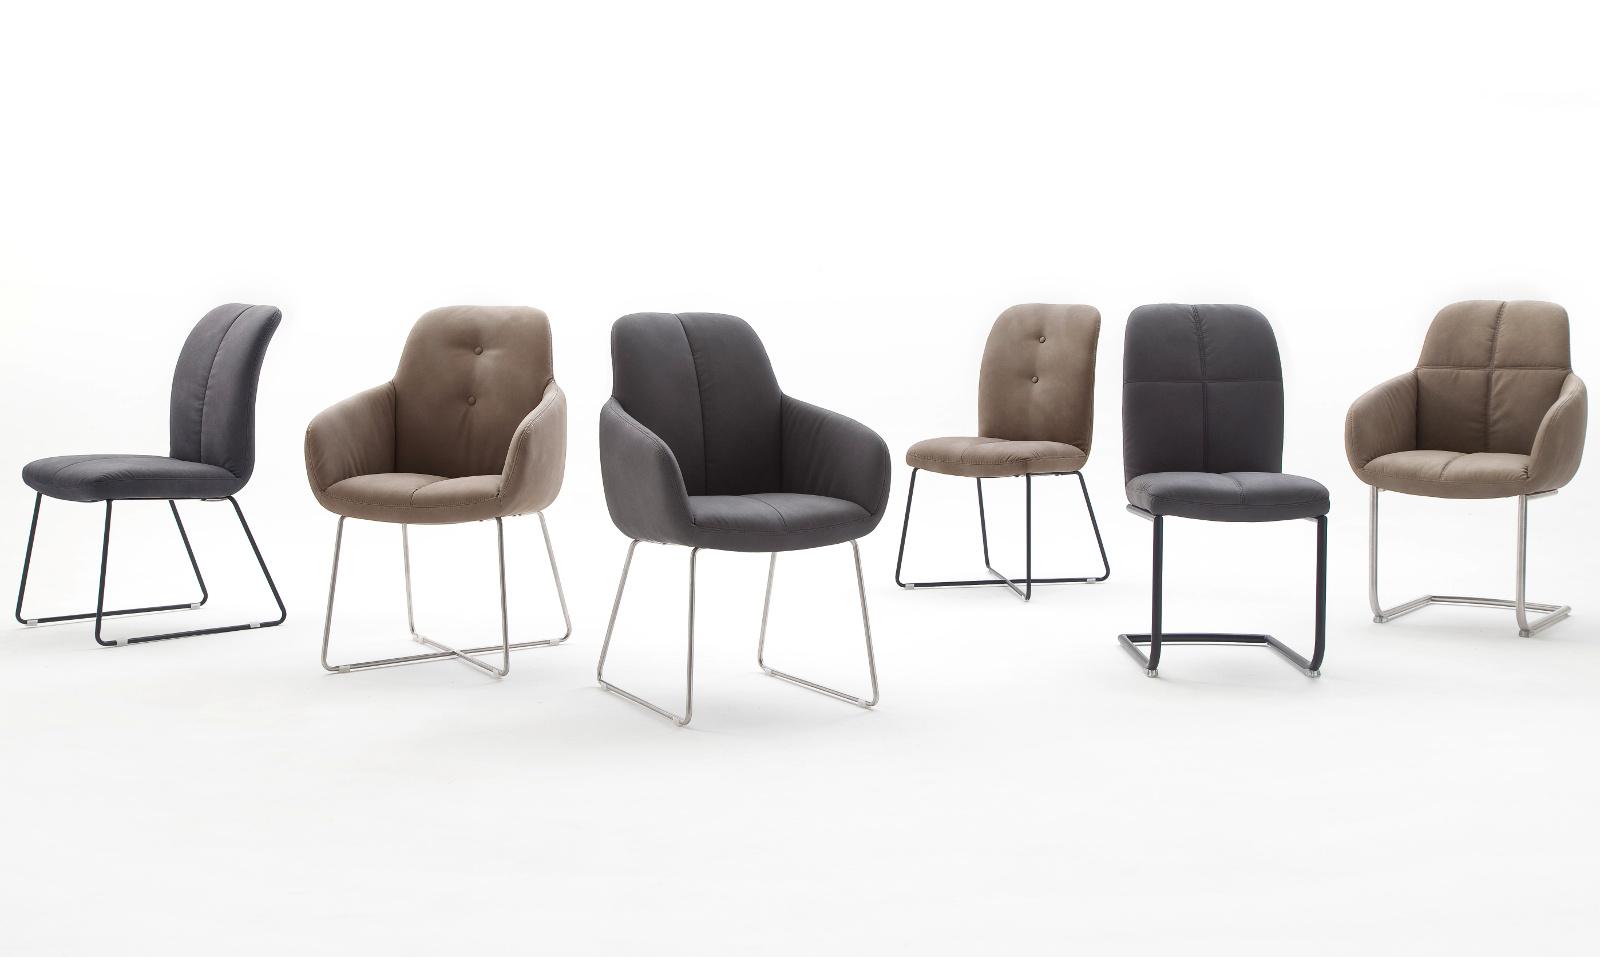 tv element lowboard grau hochglanz lack livorno. Black Bedroom Furniture Sets. Home Design Ideas